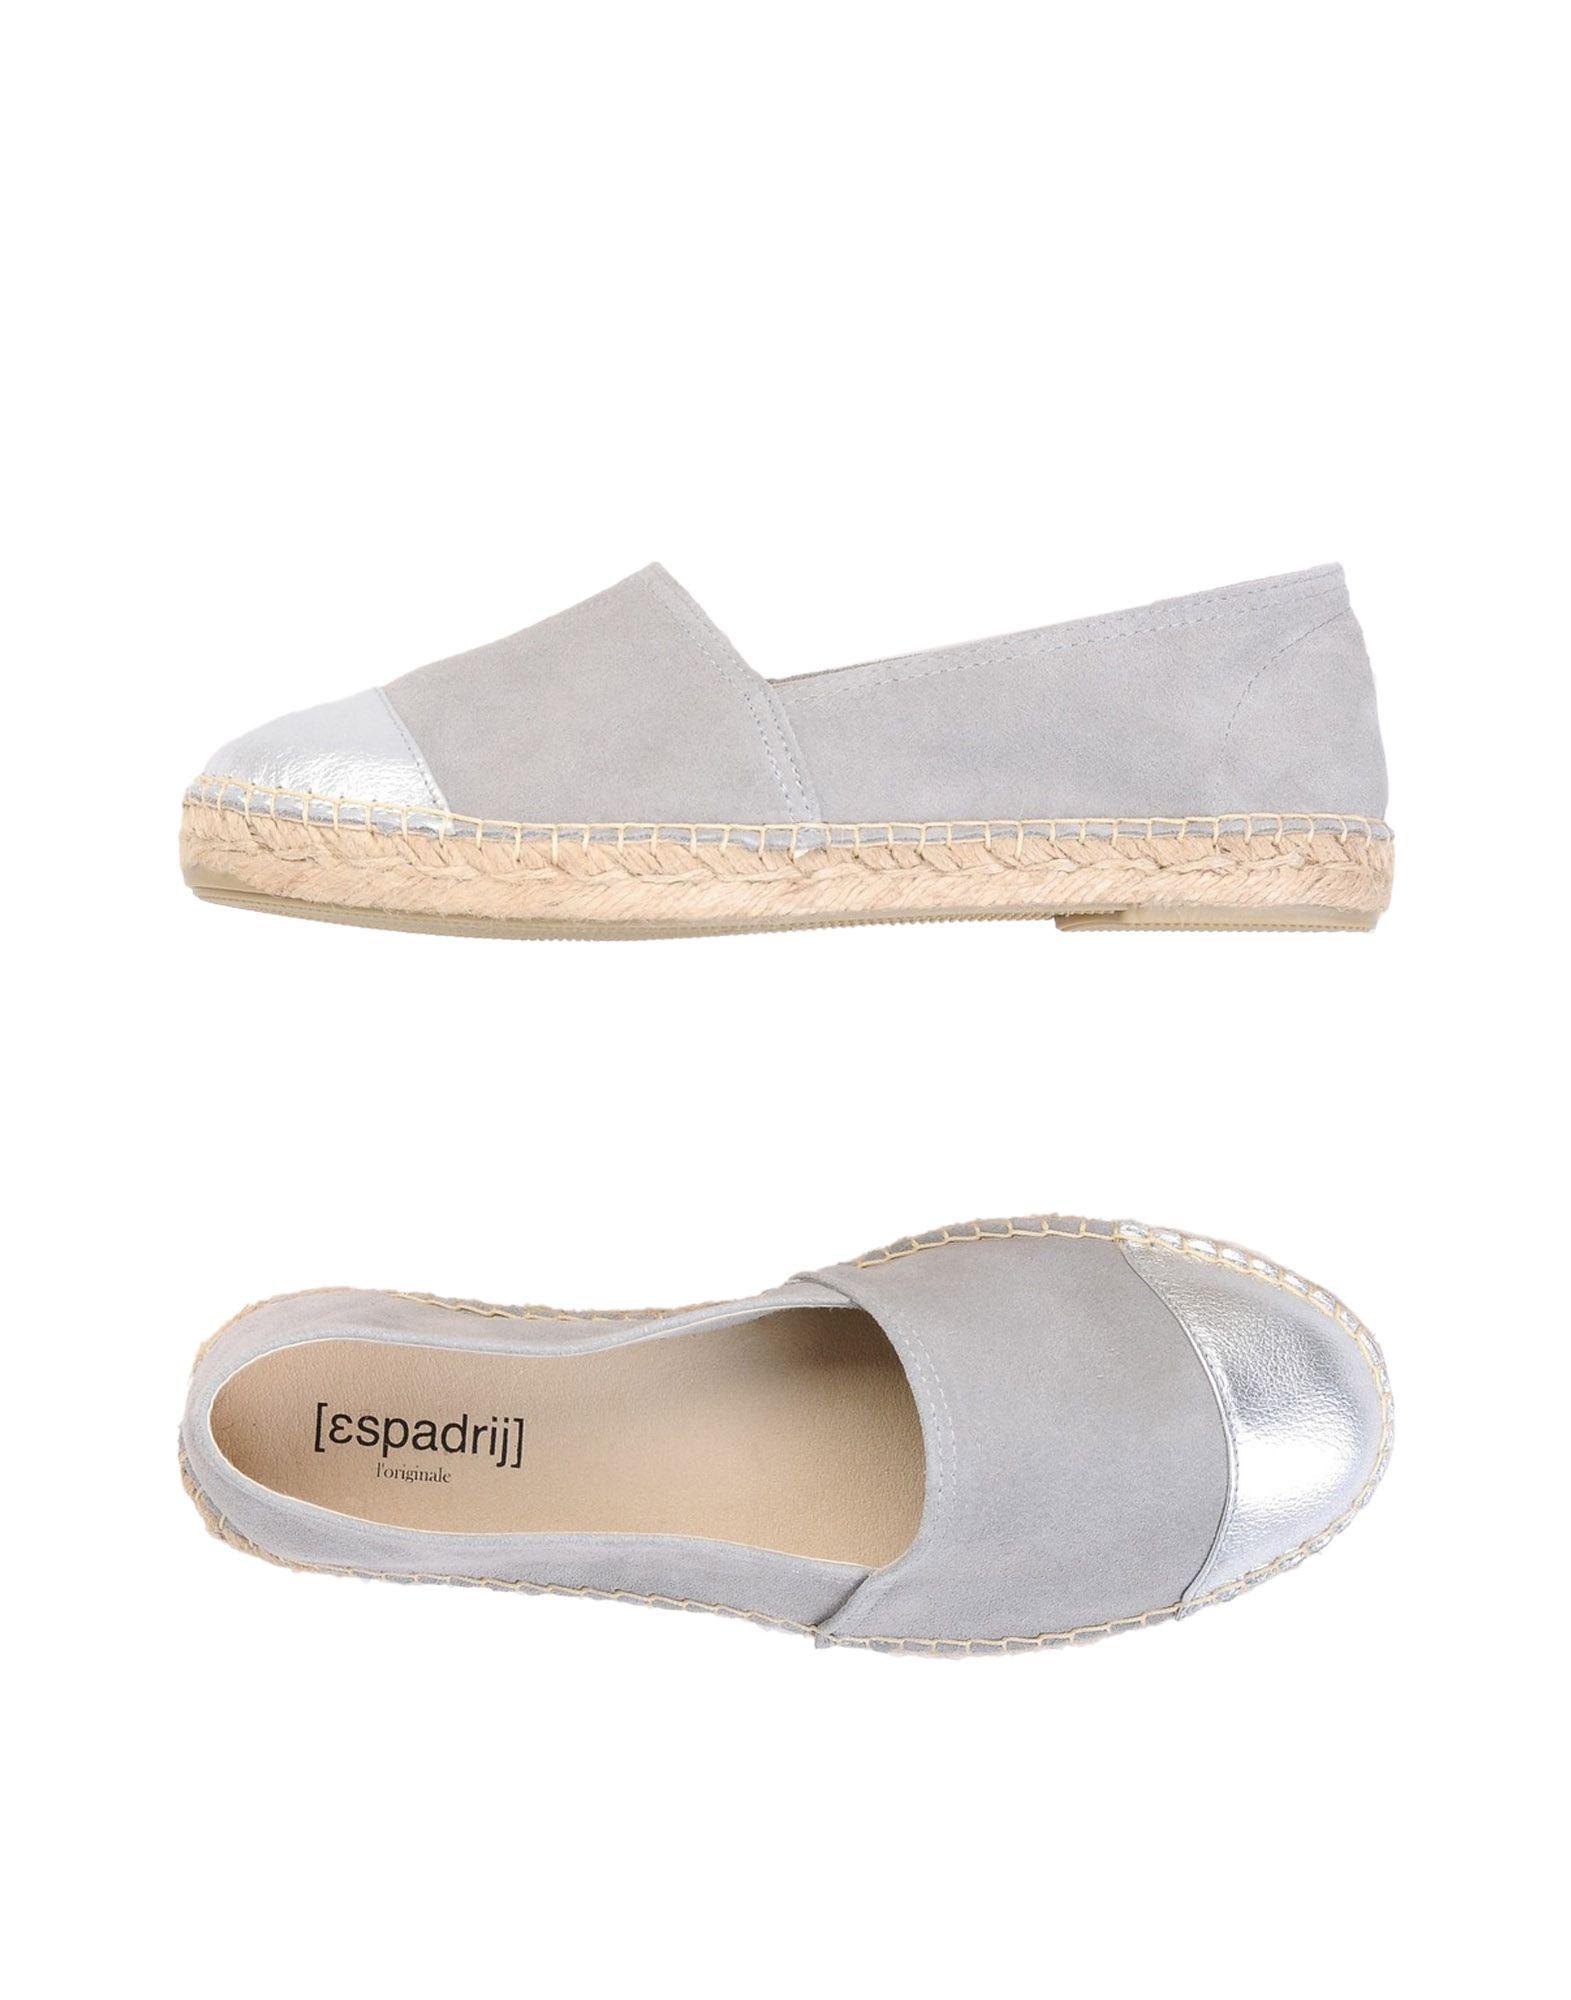 [Espadrij] Classic Cap 3  11454307XM Gute Qualität beliebte Schuhe